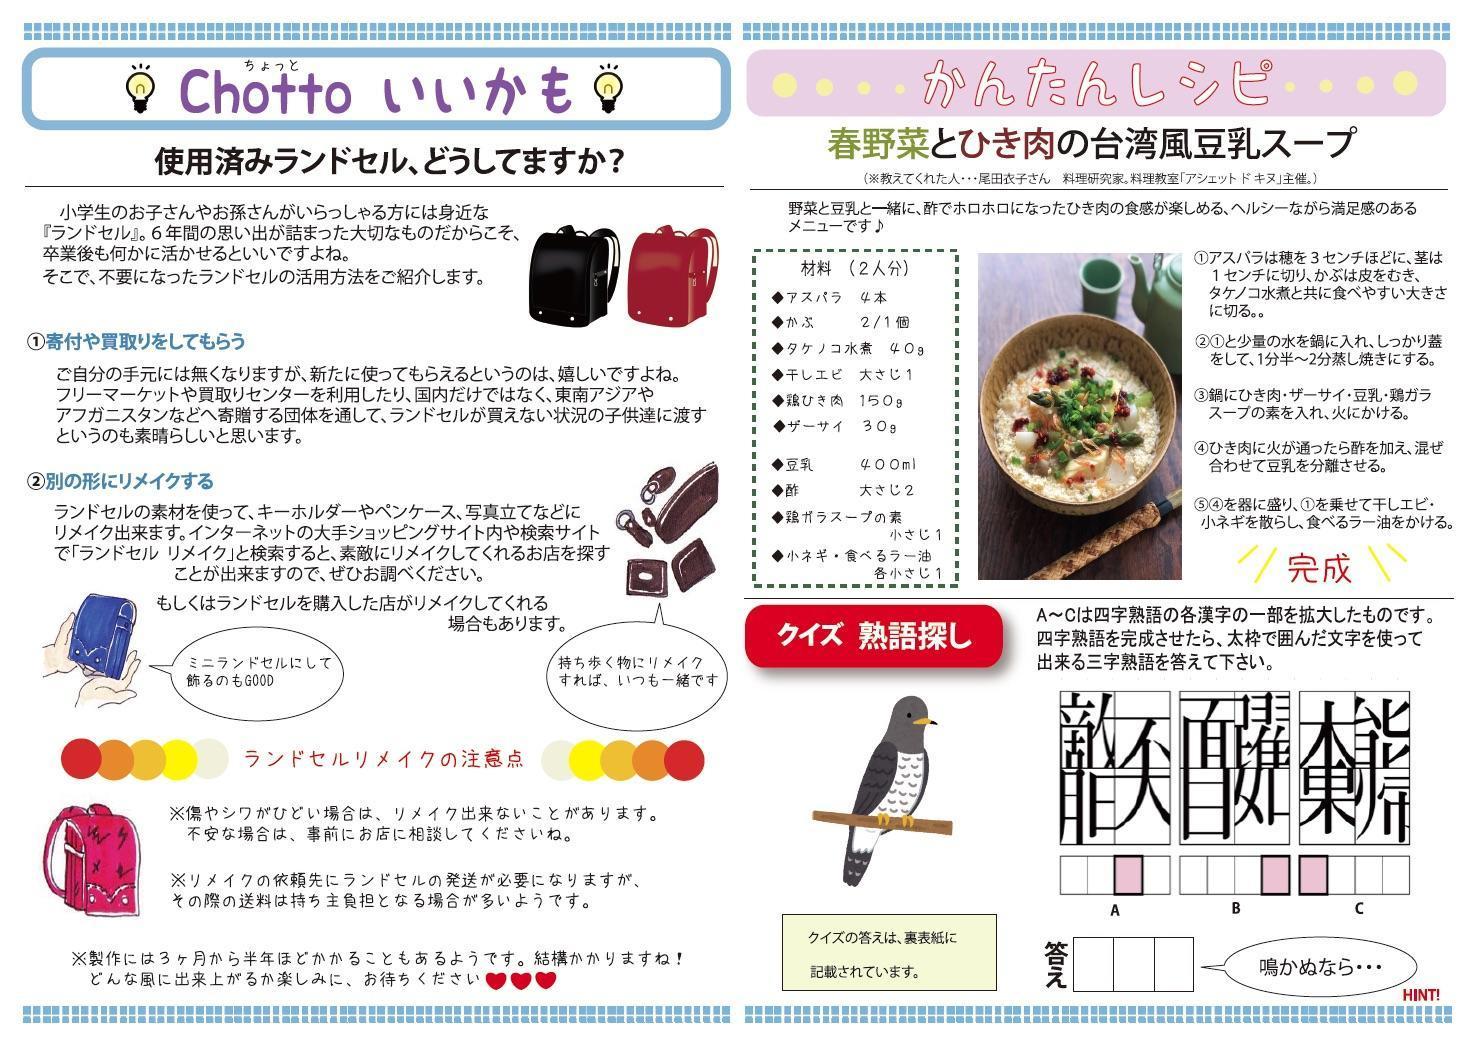 https://lixil-reformshop.jp/shop/SC00231038/photos/27fd3304eb4a4102c40a84d658b3365e058f88fb.jpg